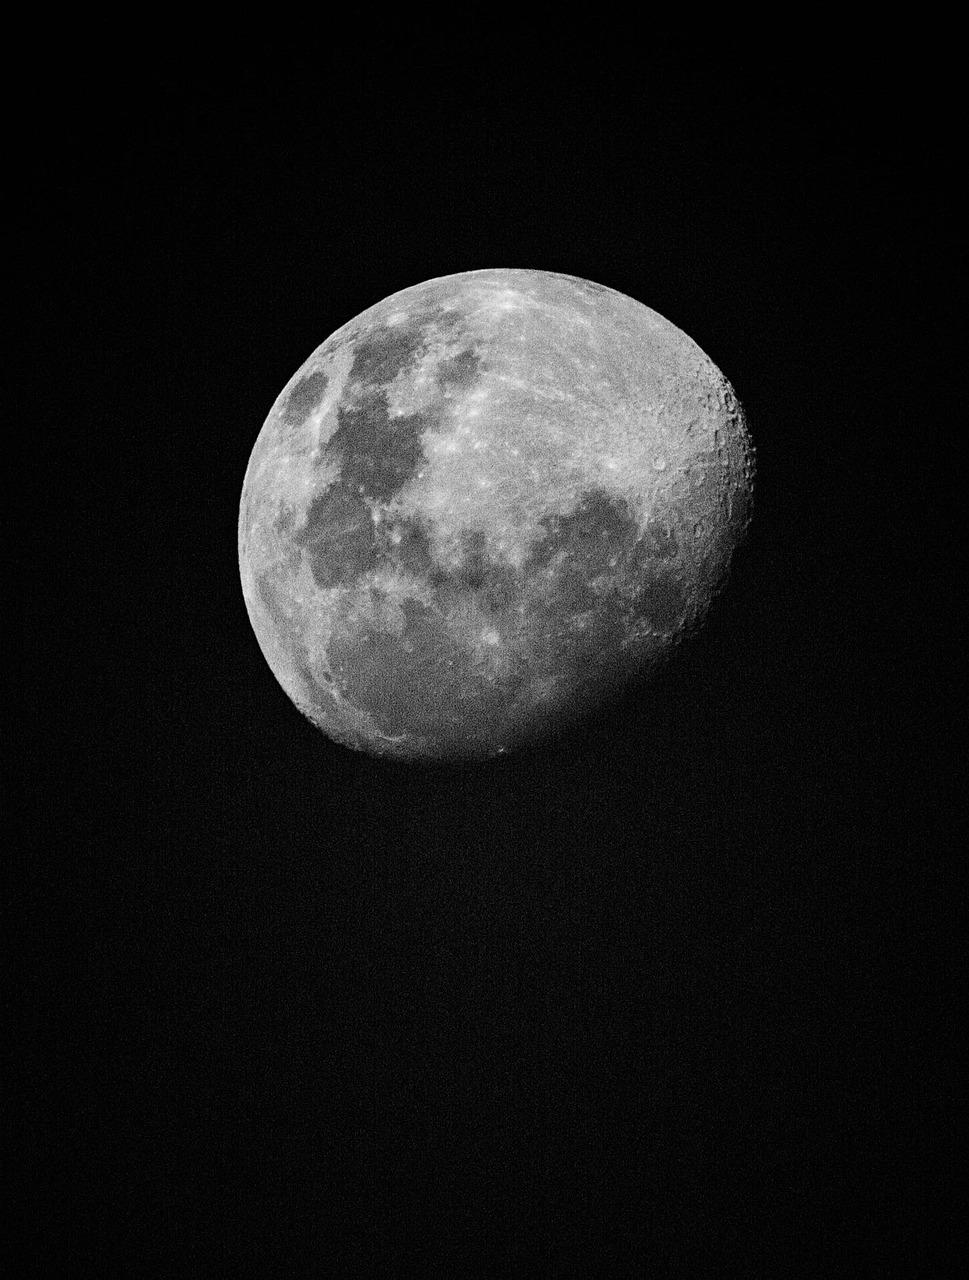 Gambar Bulan Hitam Putih : gambar, bulan, hitam, putih, Bulan, Hitam, Putih, Gratis, Pixabay